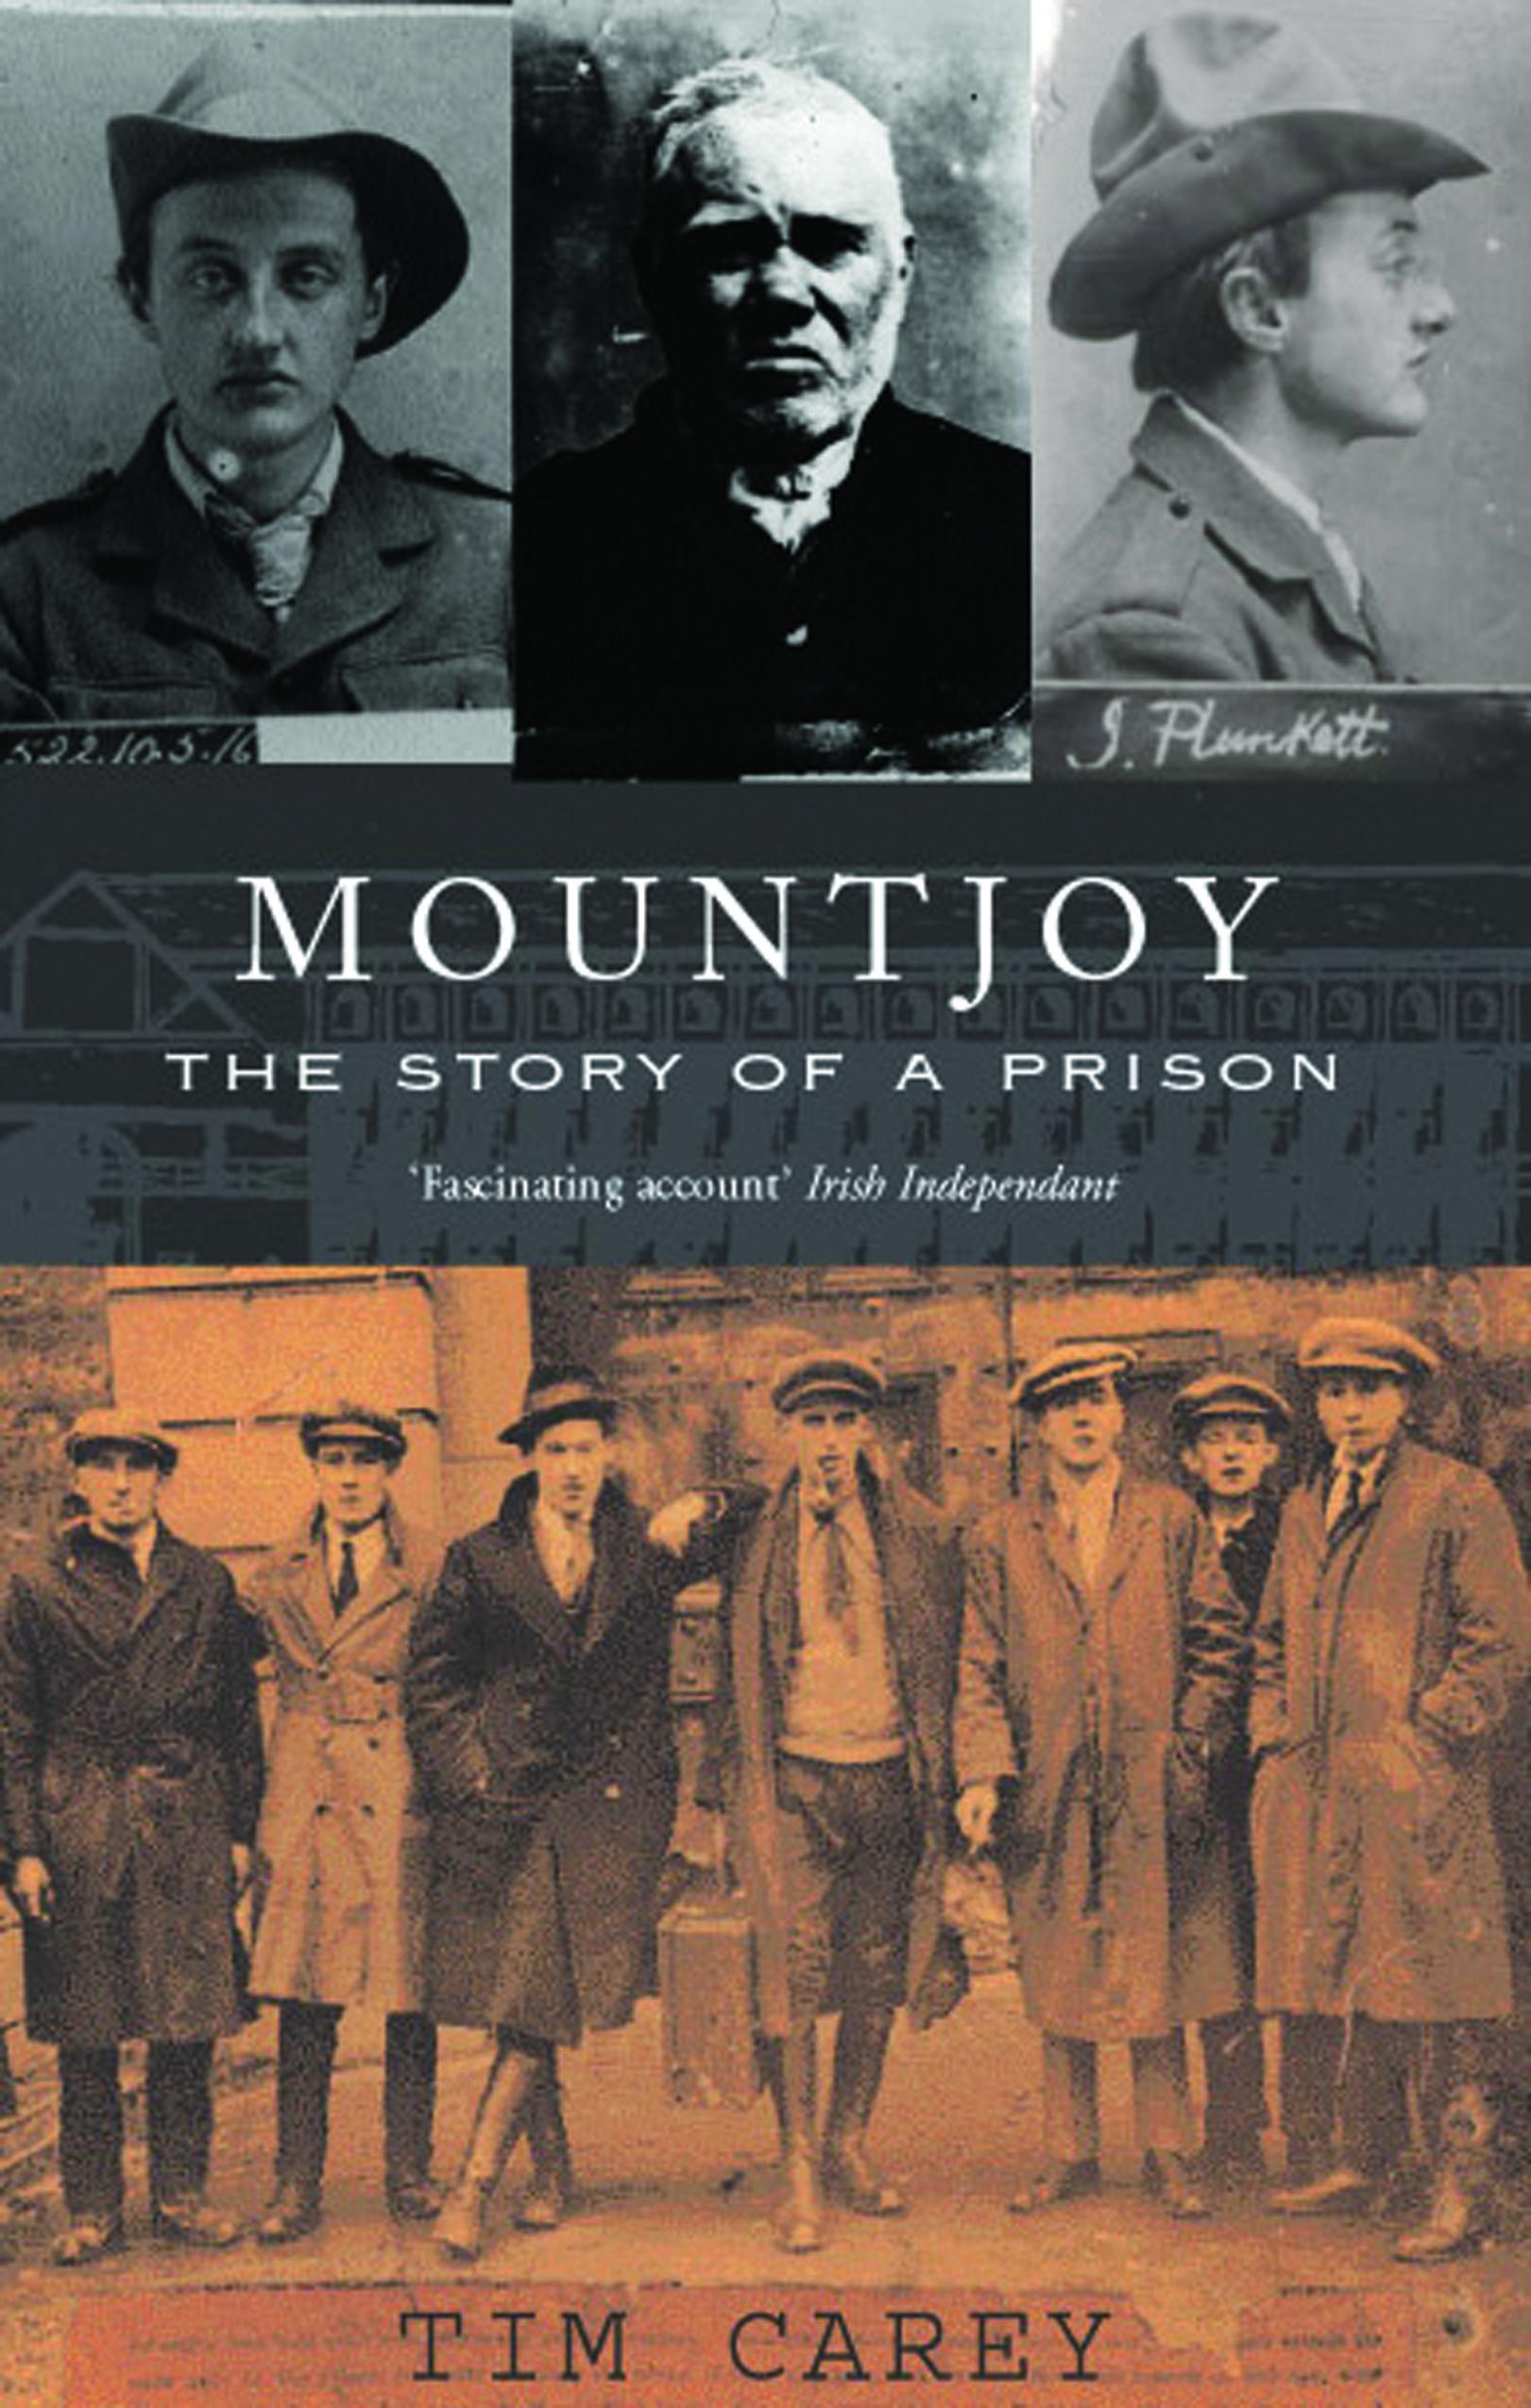 mountjoy-cover